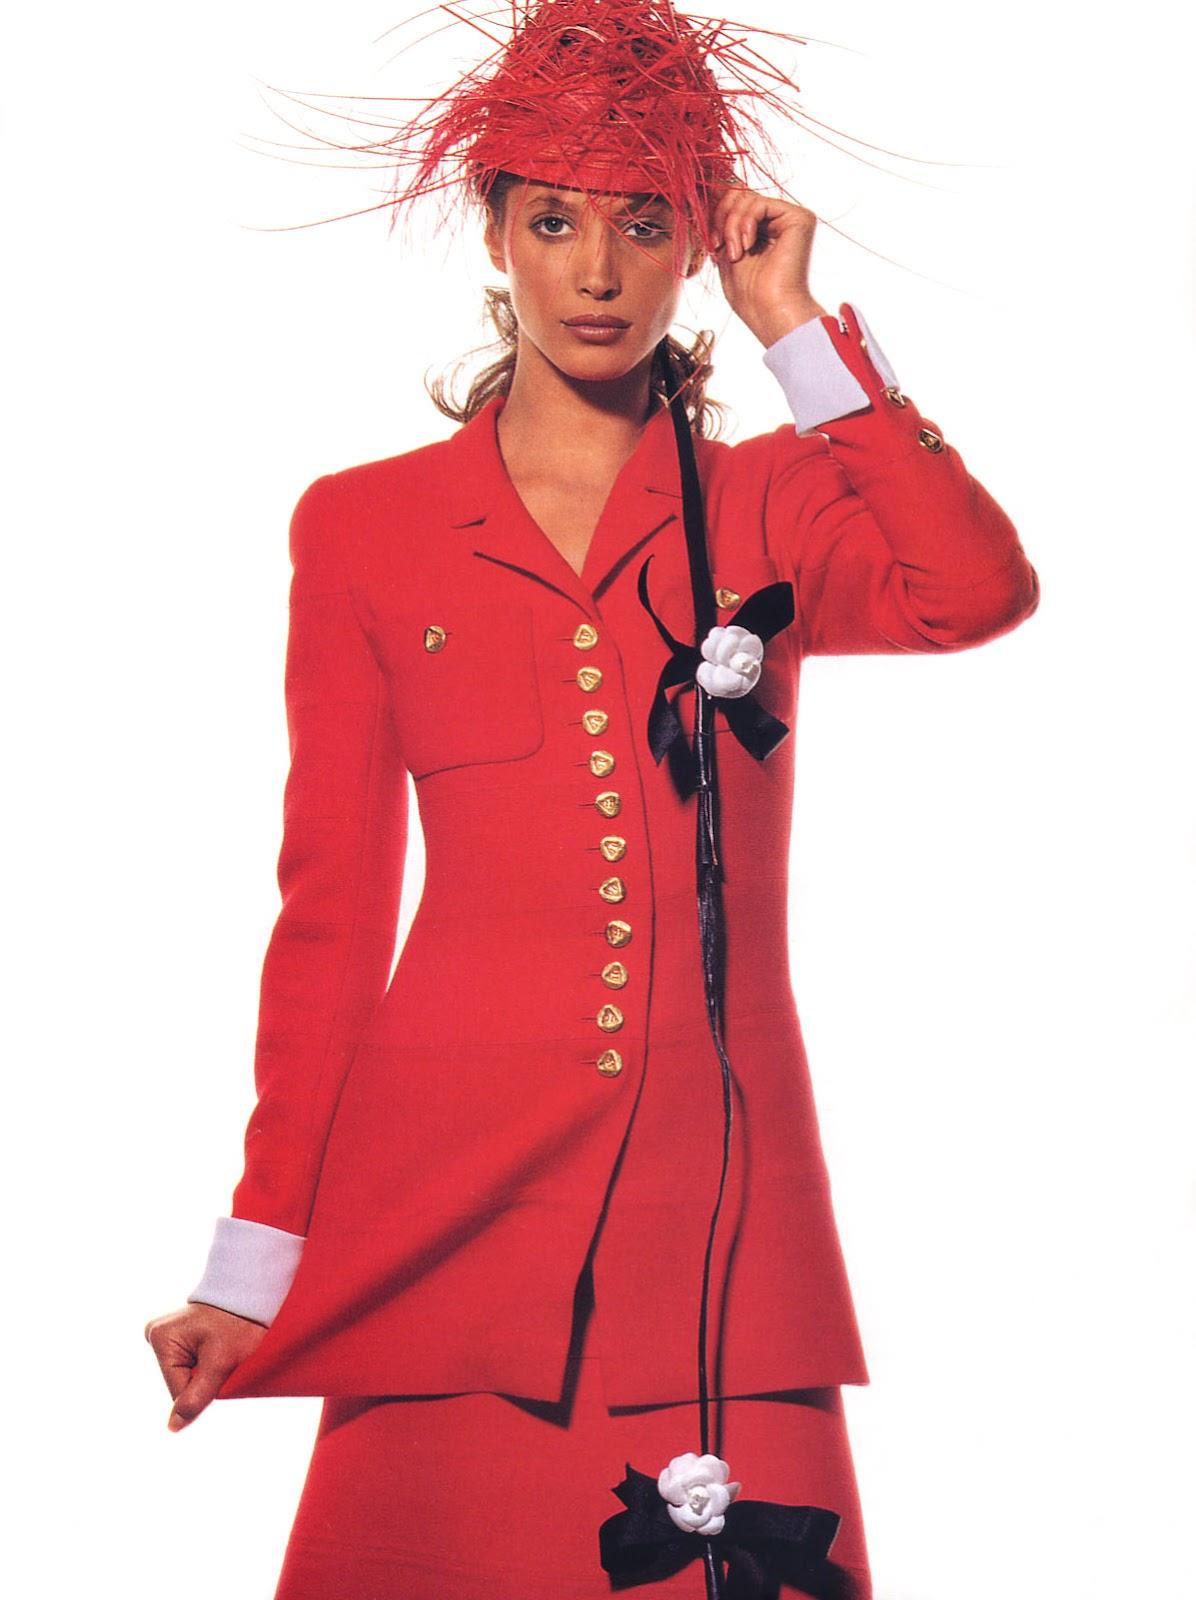 http://4.bp.blogspot.com/-CRSD_qOcWE4/T0UctHMxY0I/AAAAAAAAAbU/LmgT2sWYork/s1600/1993+03+Vogue+Us+03+Ph+Irving+Penn+Christy+Turlington.jpg